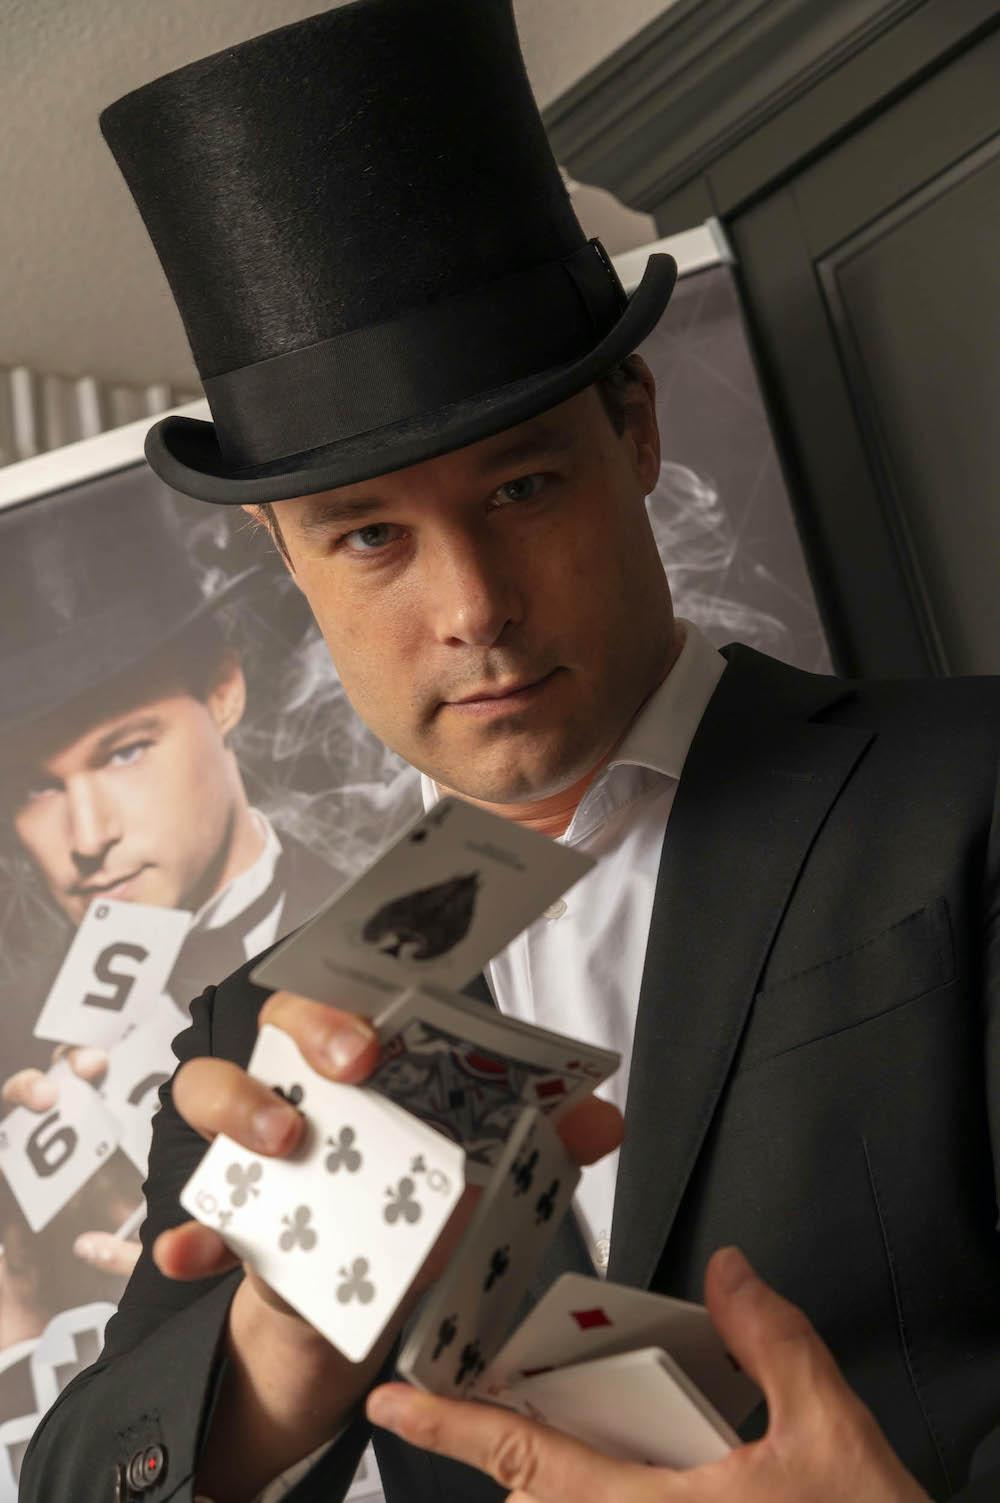 Goochelaar Jordi kaartenn